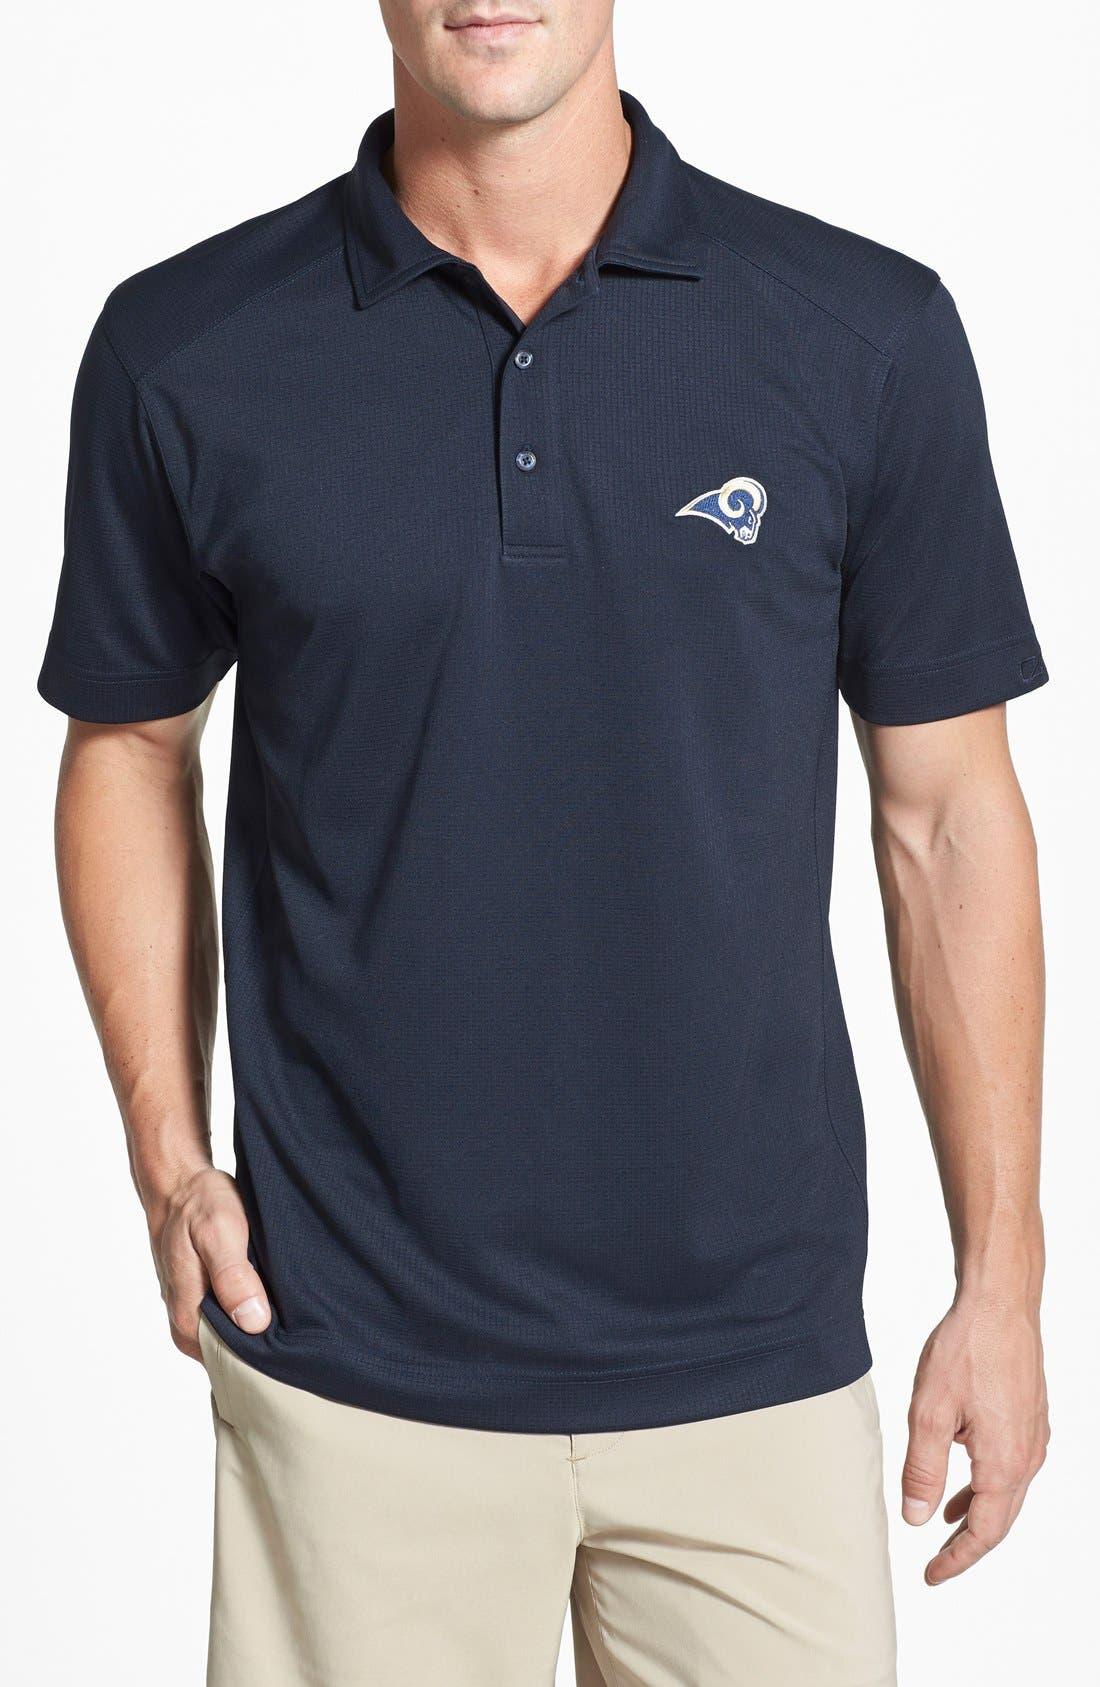 Los Angeles Rams - Genre DryTec Moisture Wicking Polo,                         Main,                         color, 420